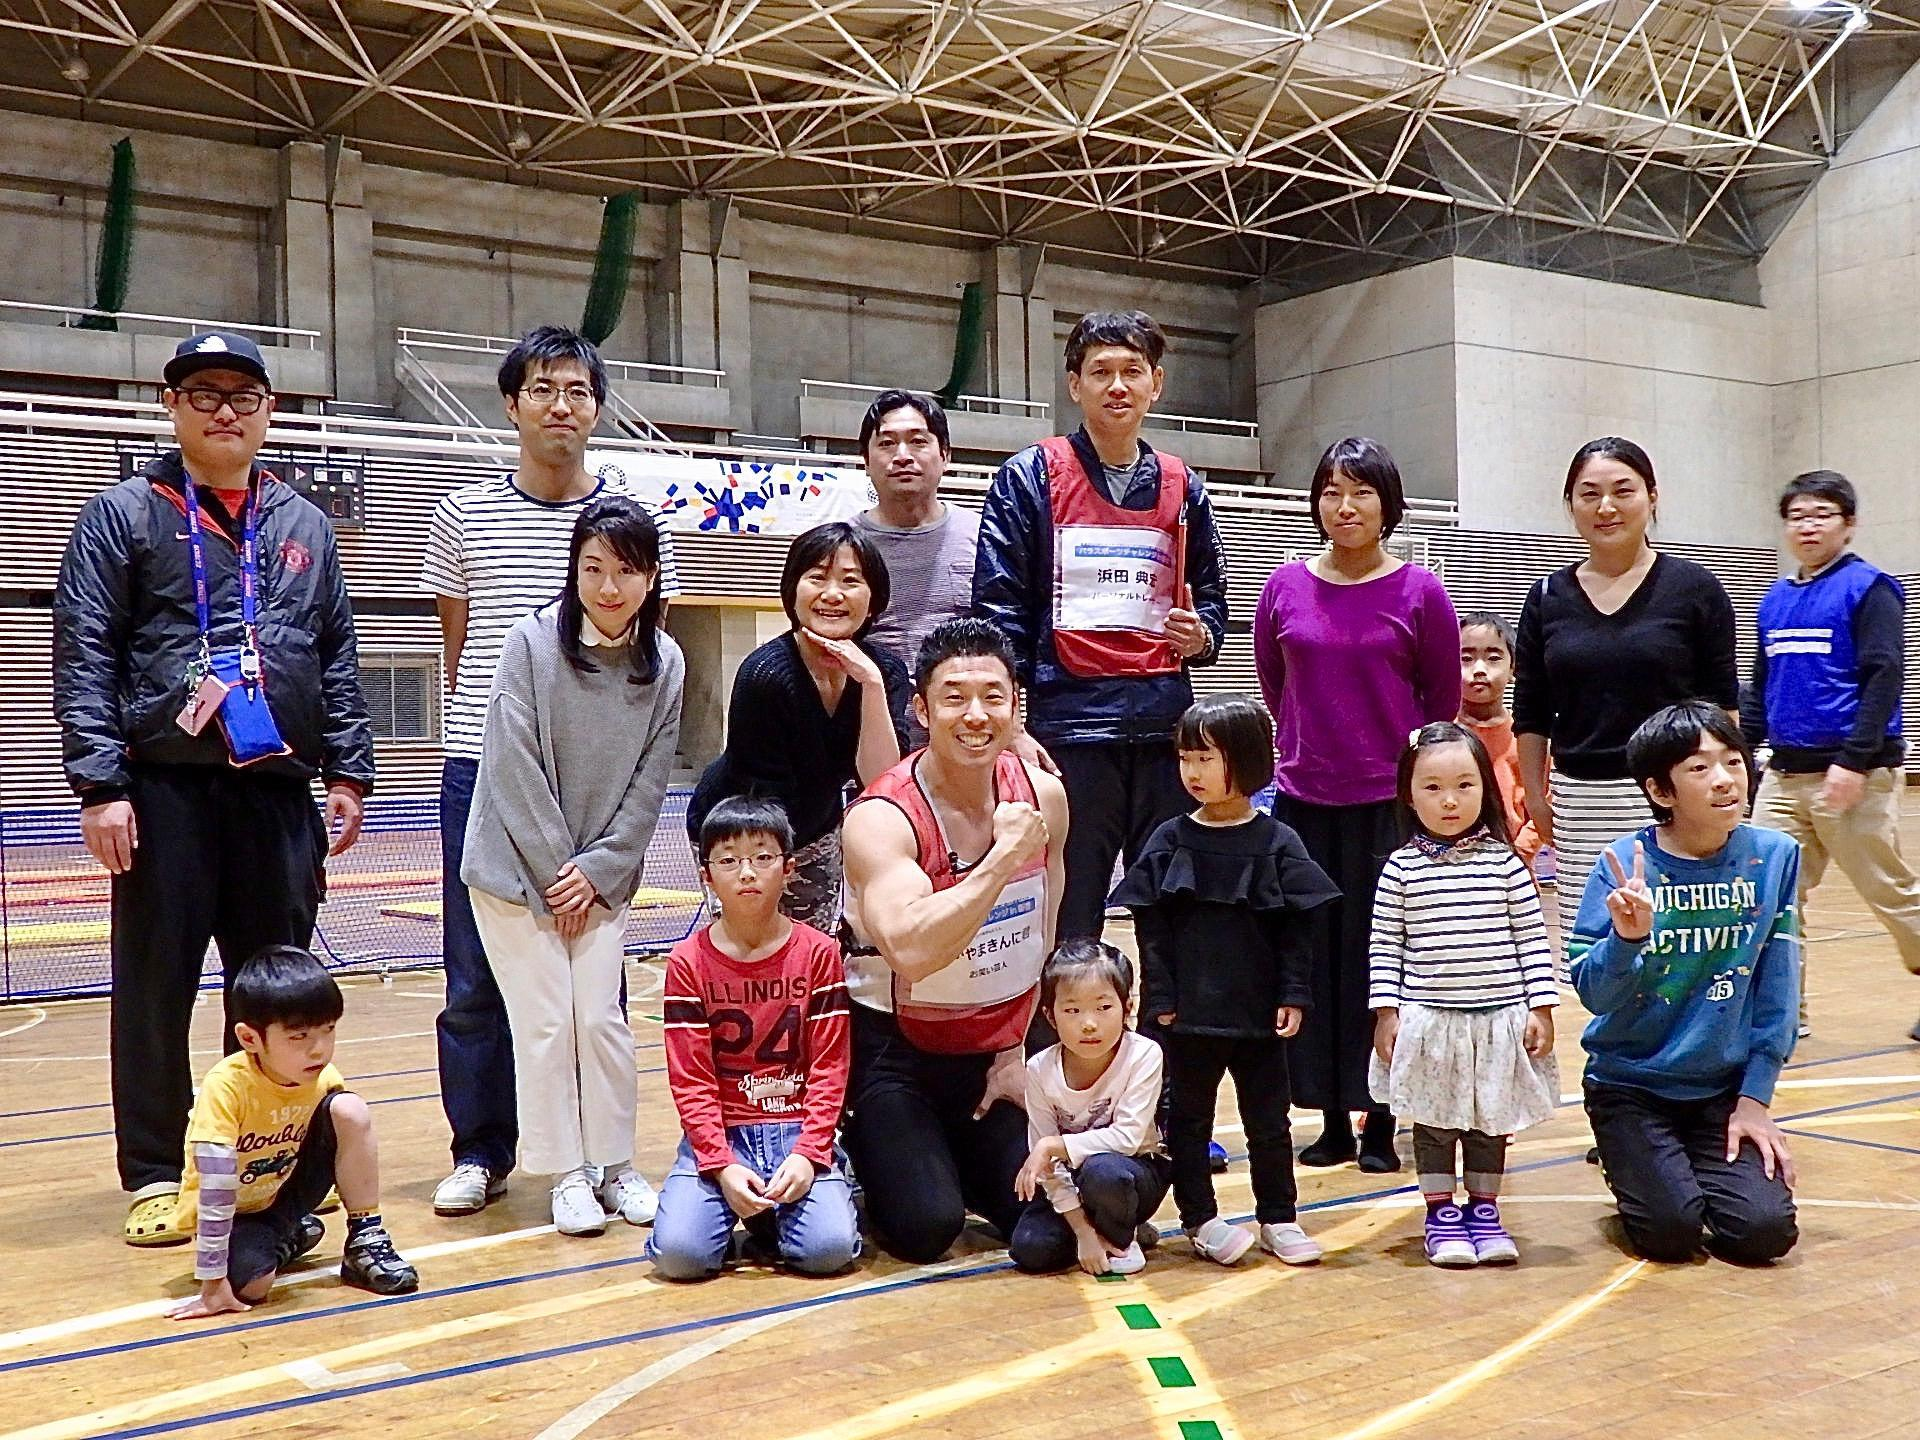 http://news.yoshimoto.co.jp/20171203111552-9dee96ce5abb9765fc7394b97353e66095d207b2.jpg